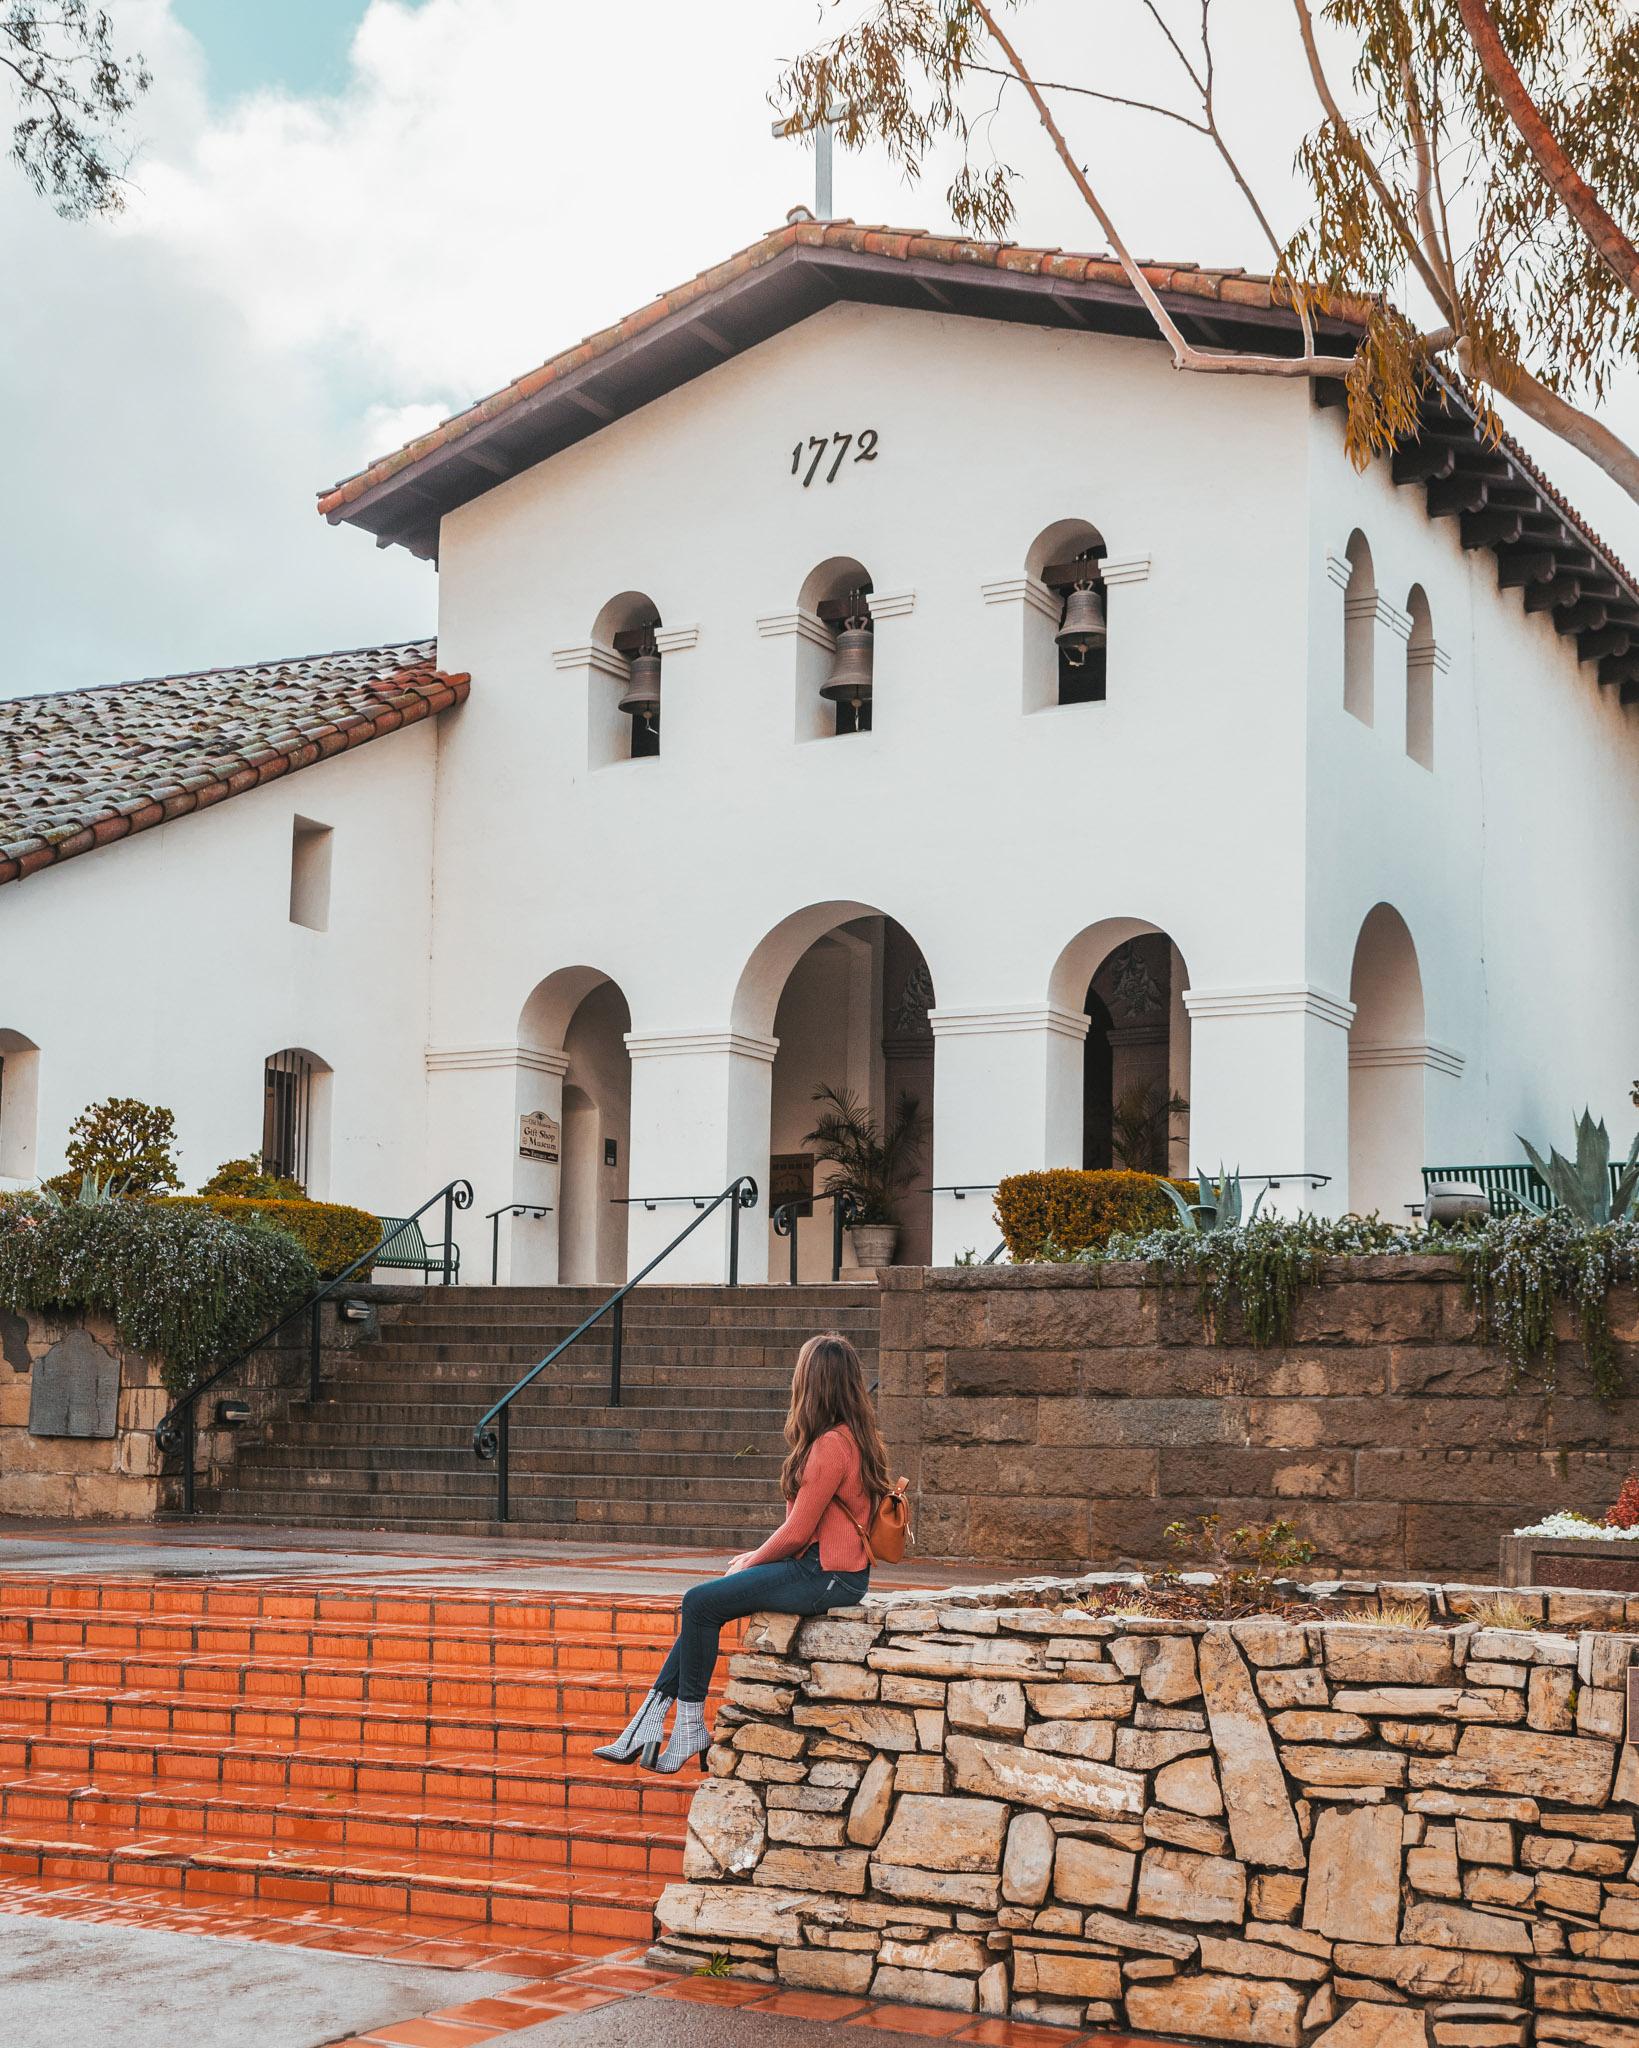 Mission San Luis Obispo de Tolosa ~ The Most Instagrammable Spots in SLO CAL County ~ #readysetjetset #slocal #california #blogpost #travel #sanluisobispo